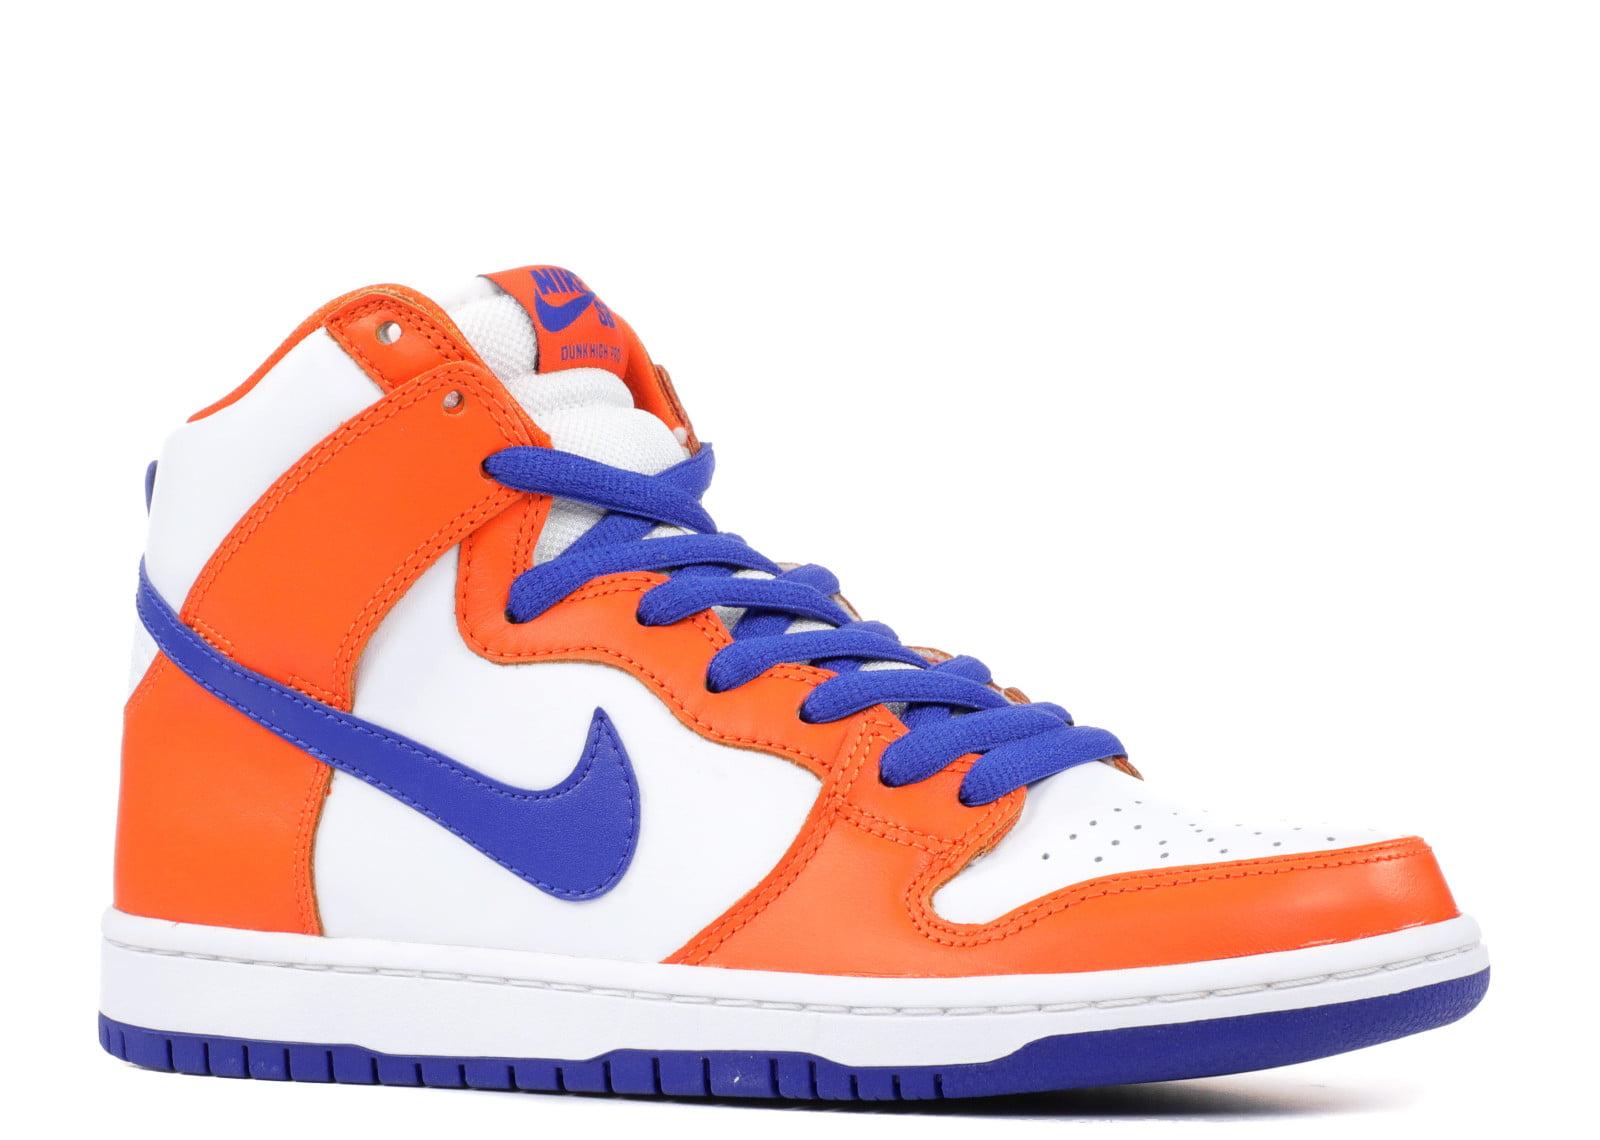 save off 76573 4cf8e Nike - Men - Nike Sb Dunk High Trd Qs Danny Supa - Ah0471-841 - Size 11